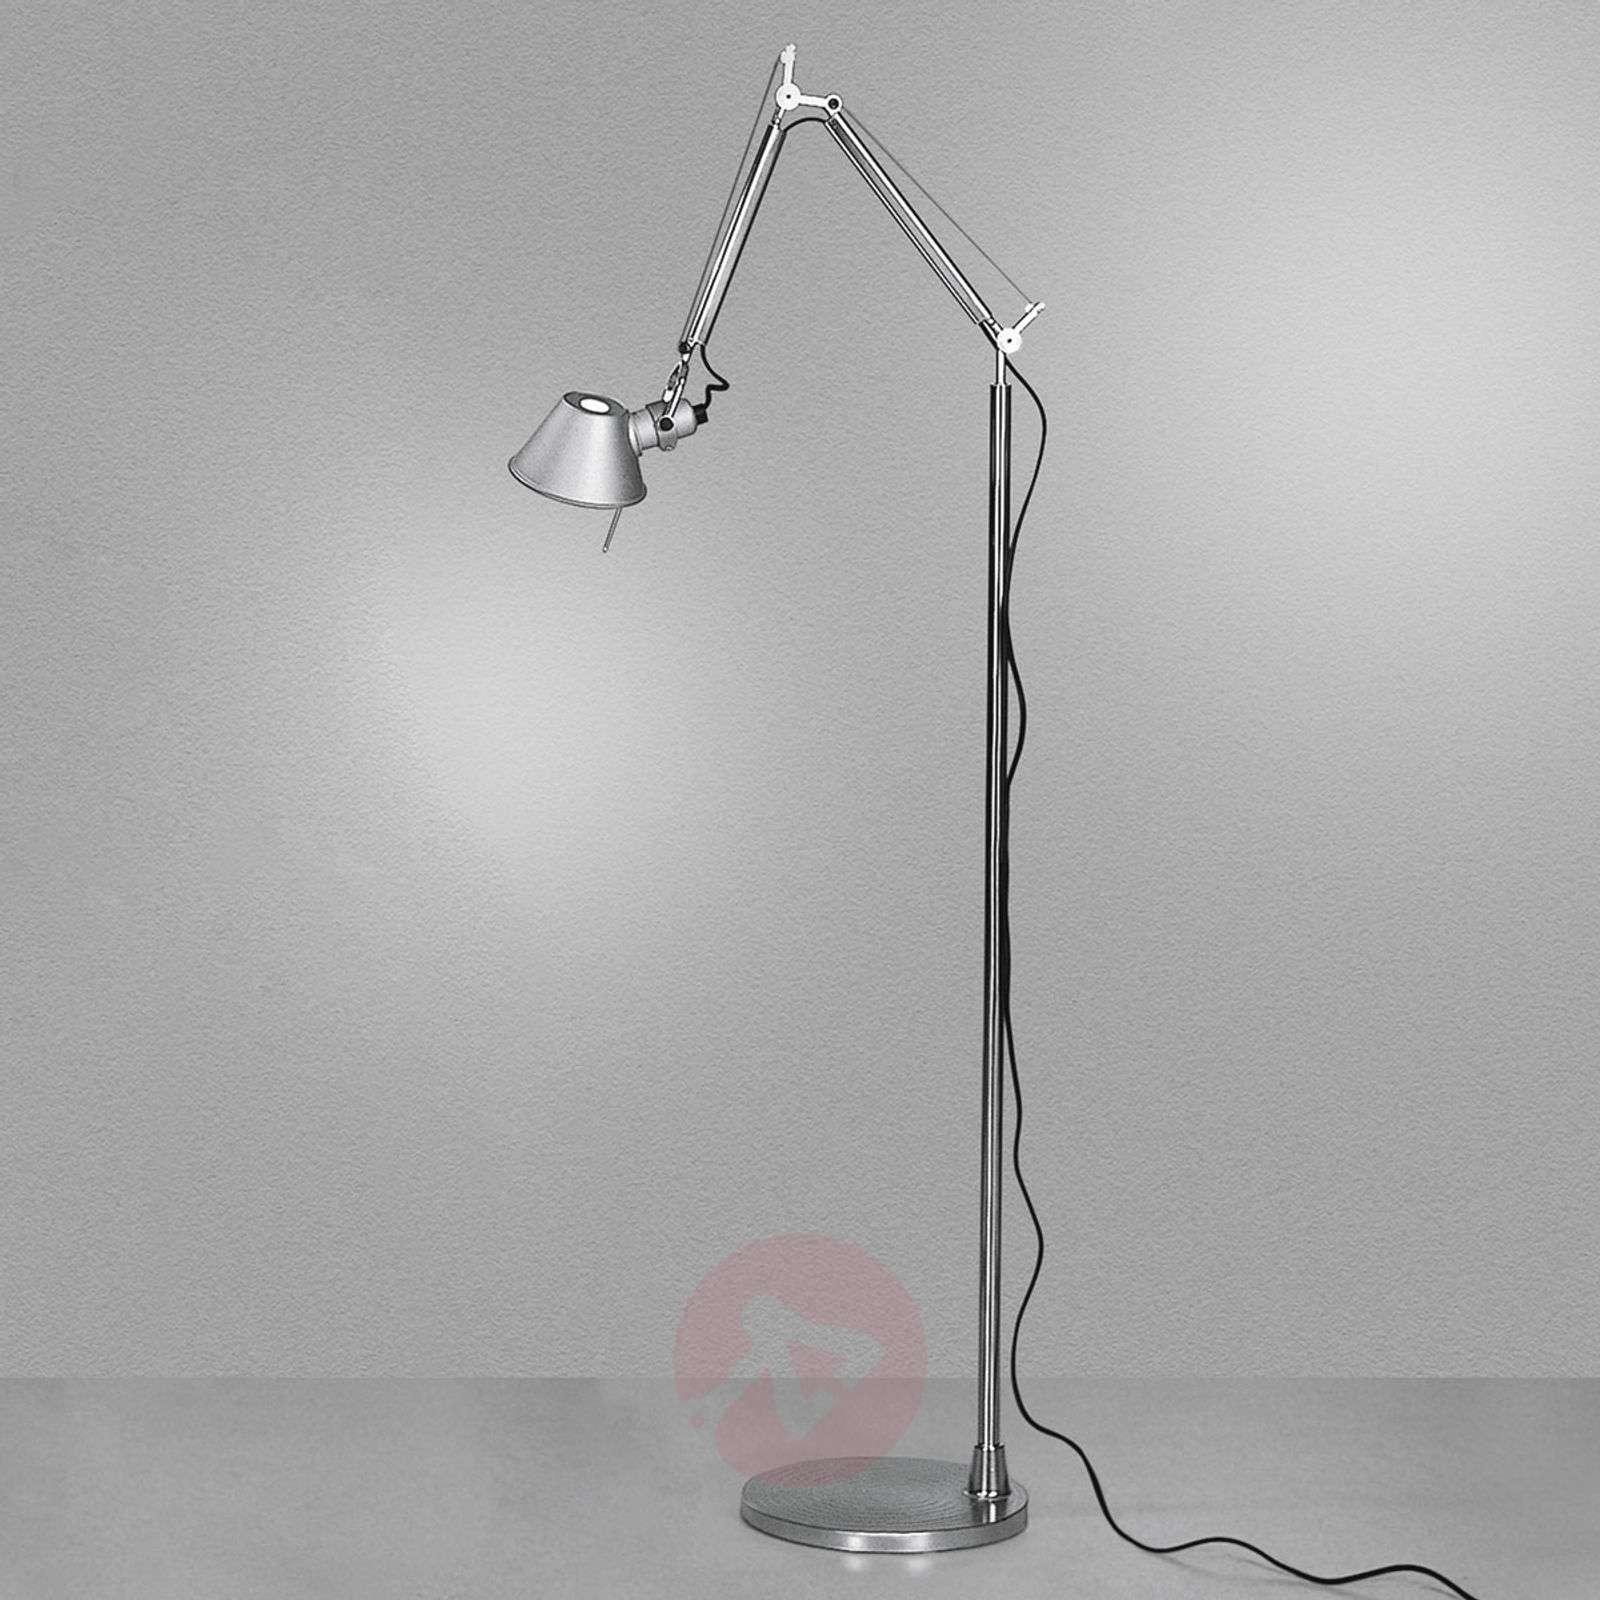 Artemide Tolomeo Micro lattiavalaisin LED 3000K-1060241-01